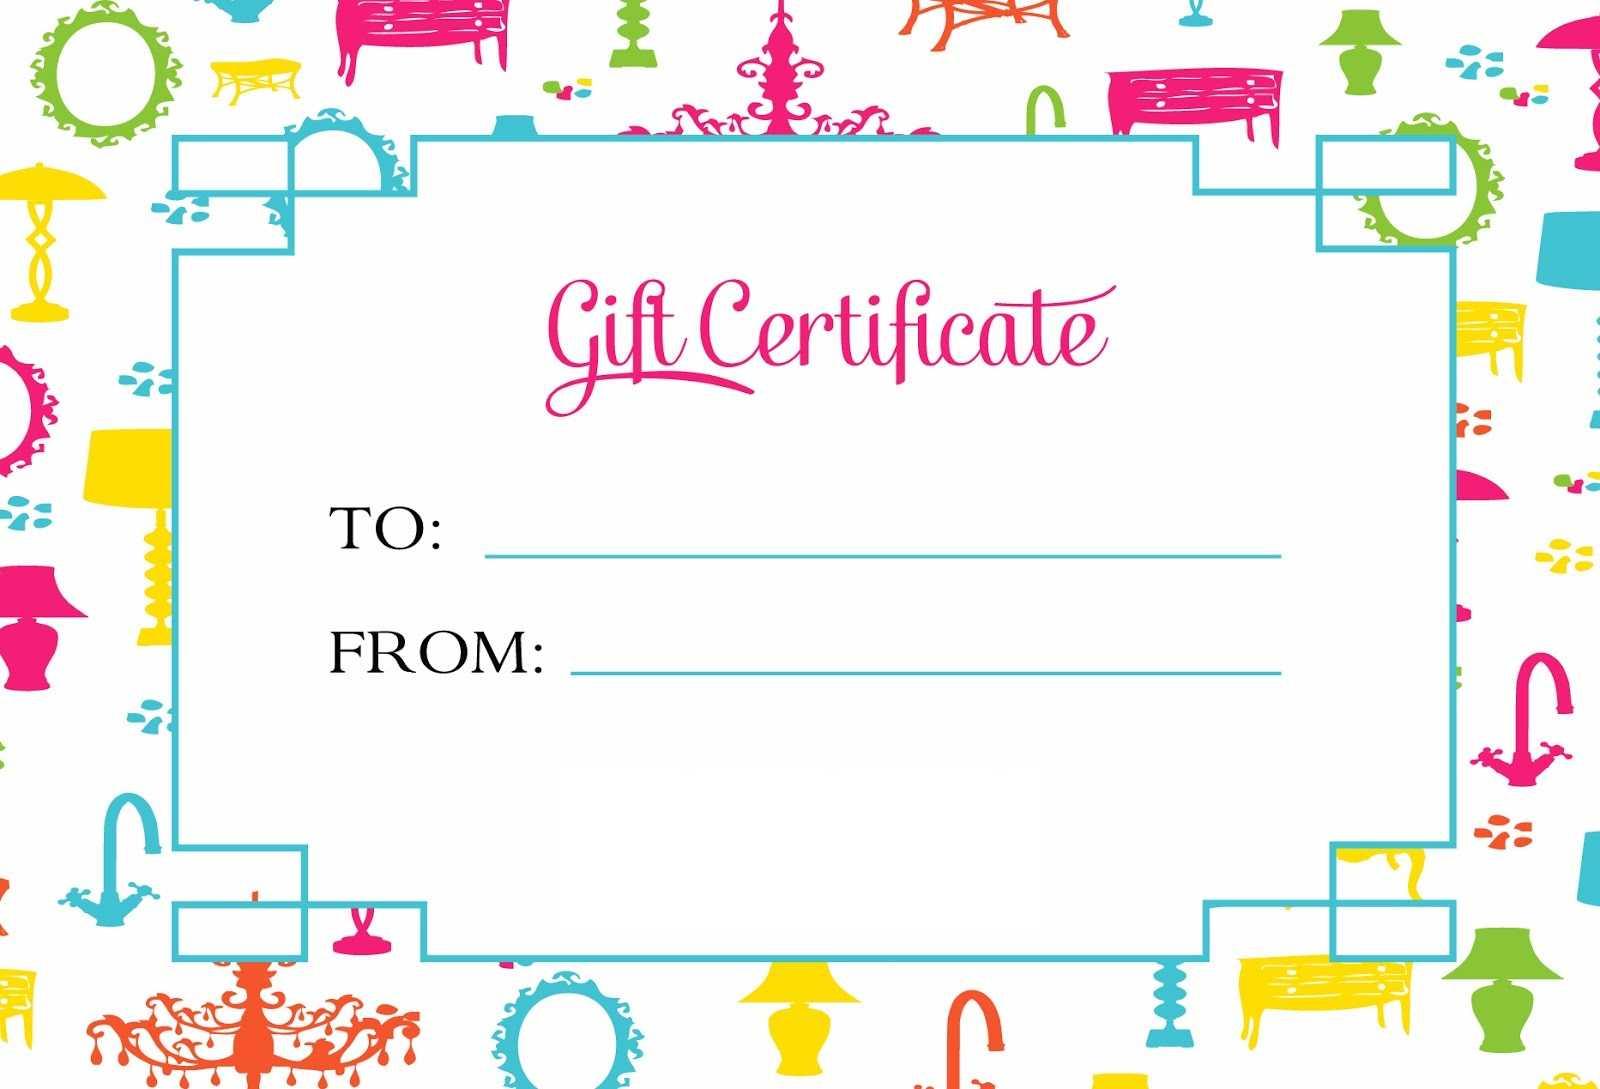 Gift Certificate Template For Kids Blanks | Loving Printable Regarding Fun Certificate Templates